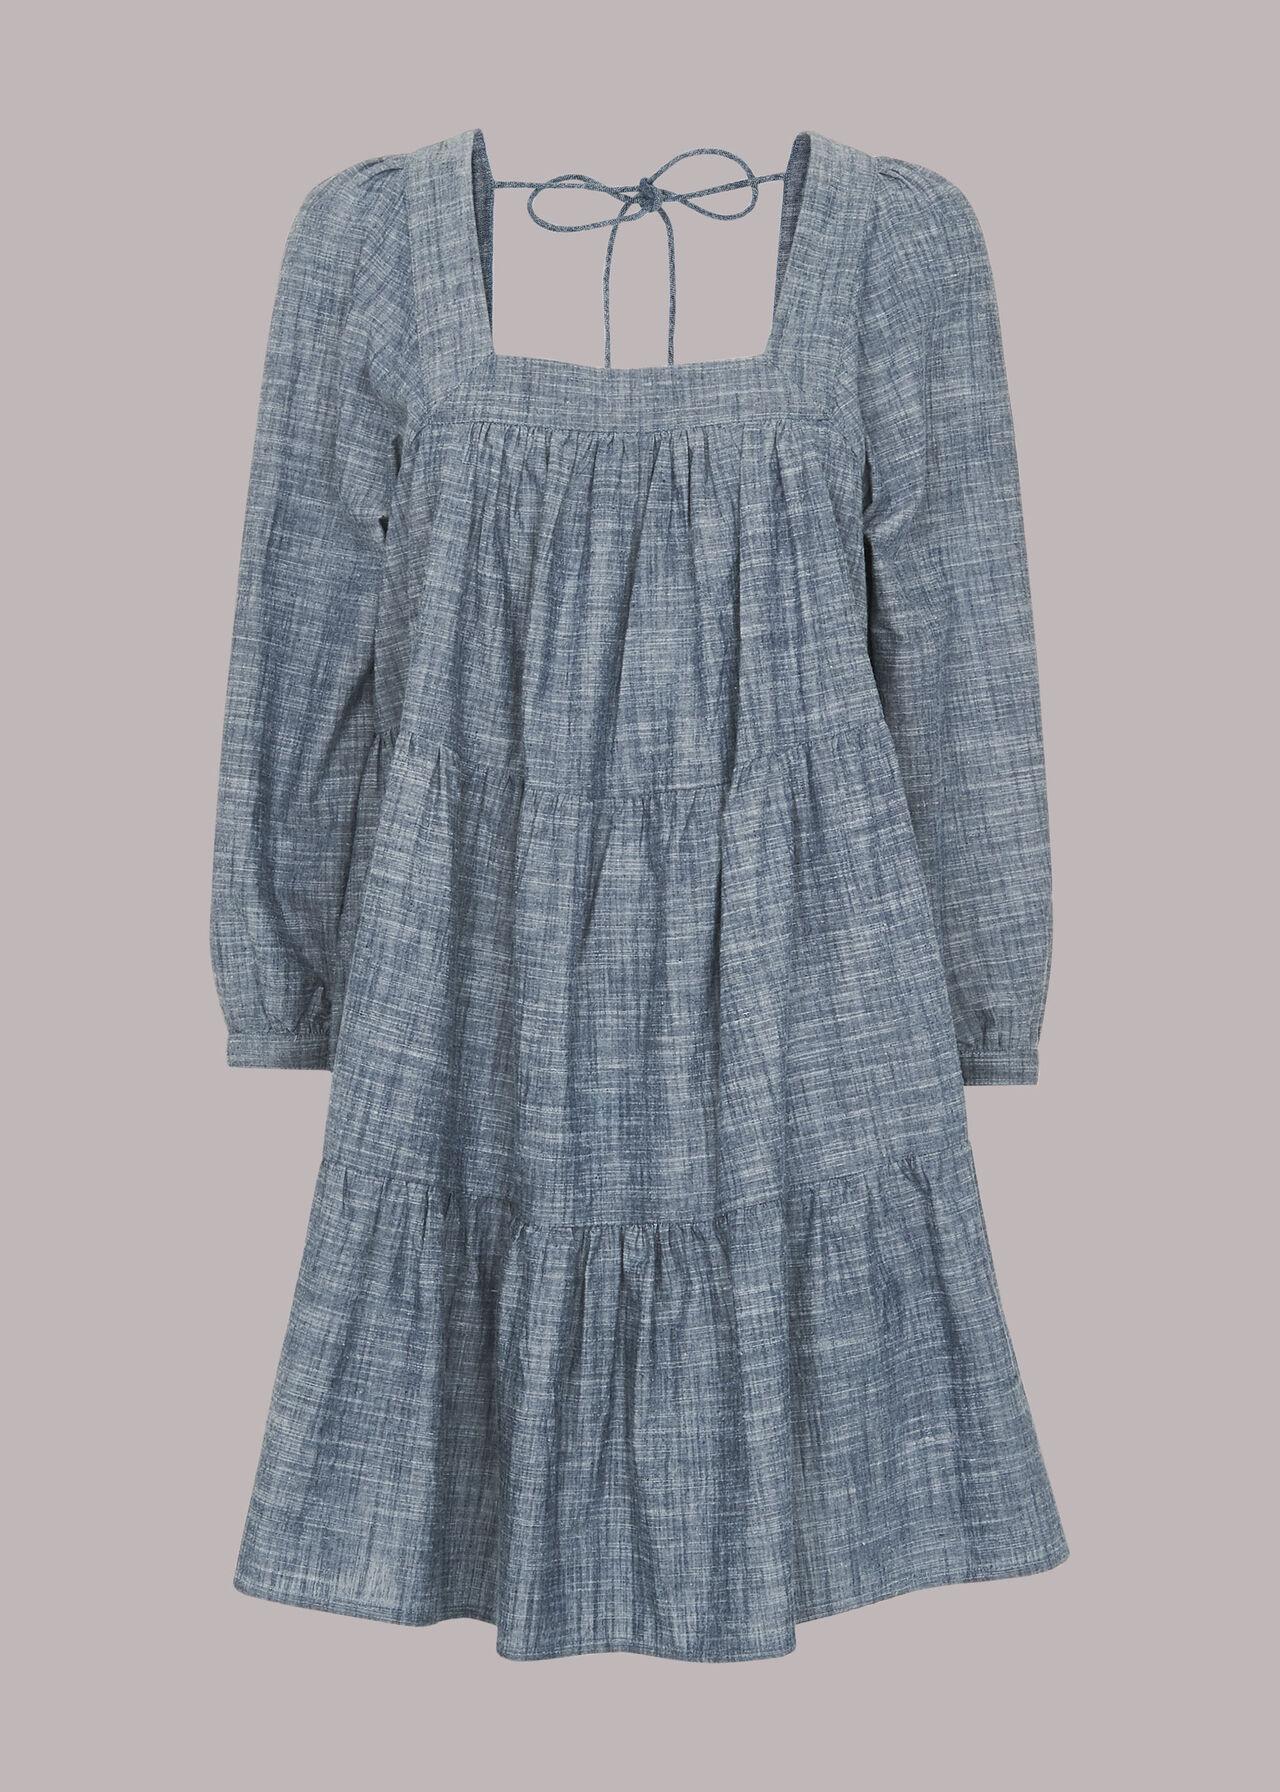 Tilly Chambray Trapeze Dress